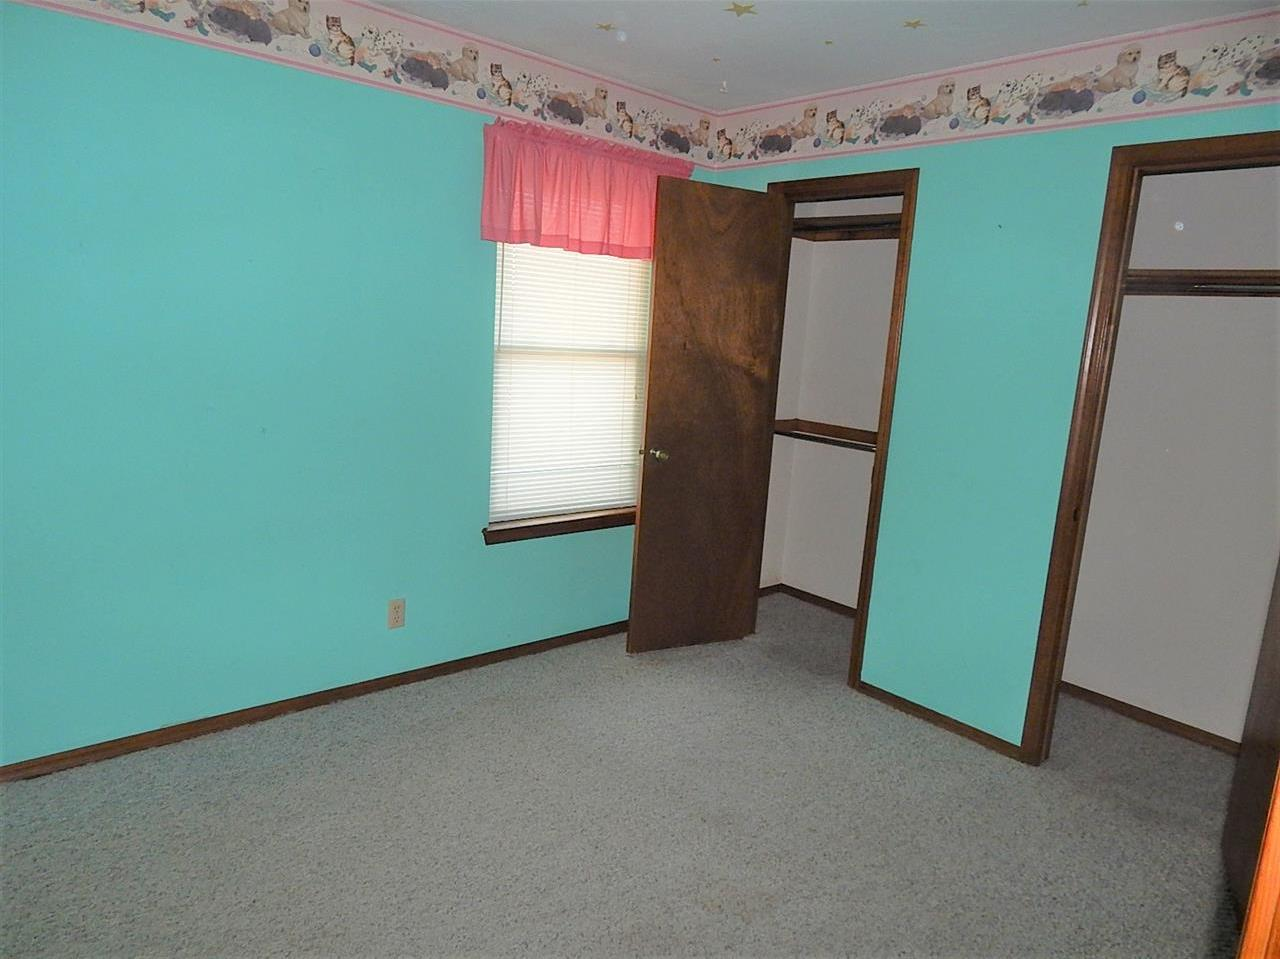 Sold Intraoffice W/MLS   321 Woodbury Ponca City, OK 74601 15